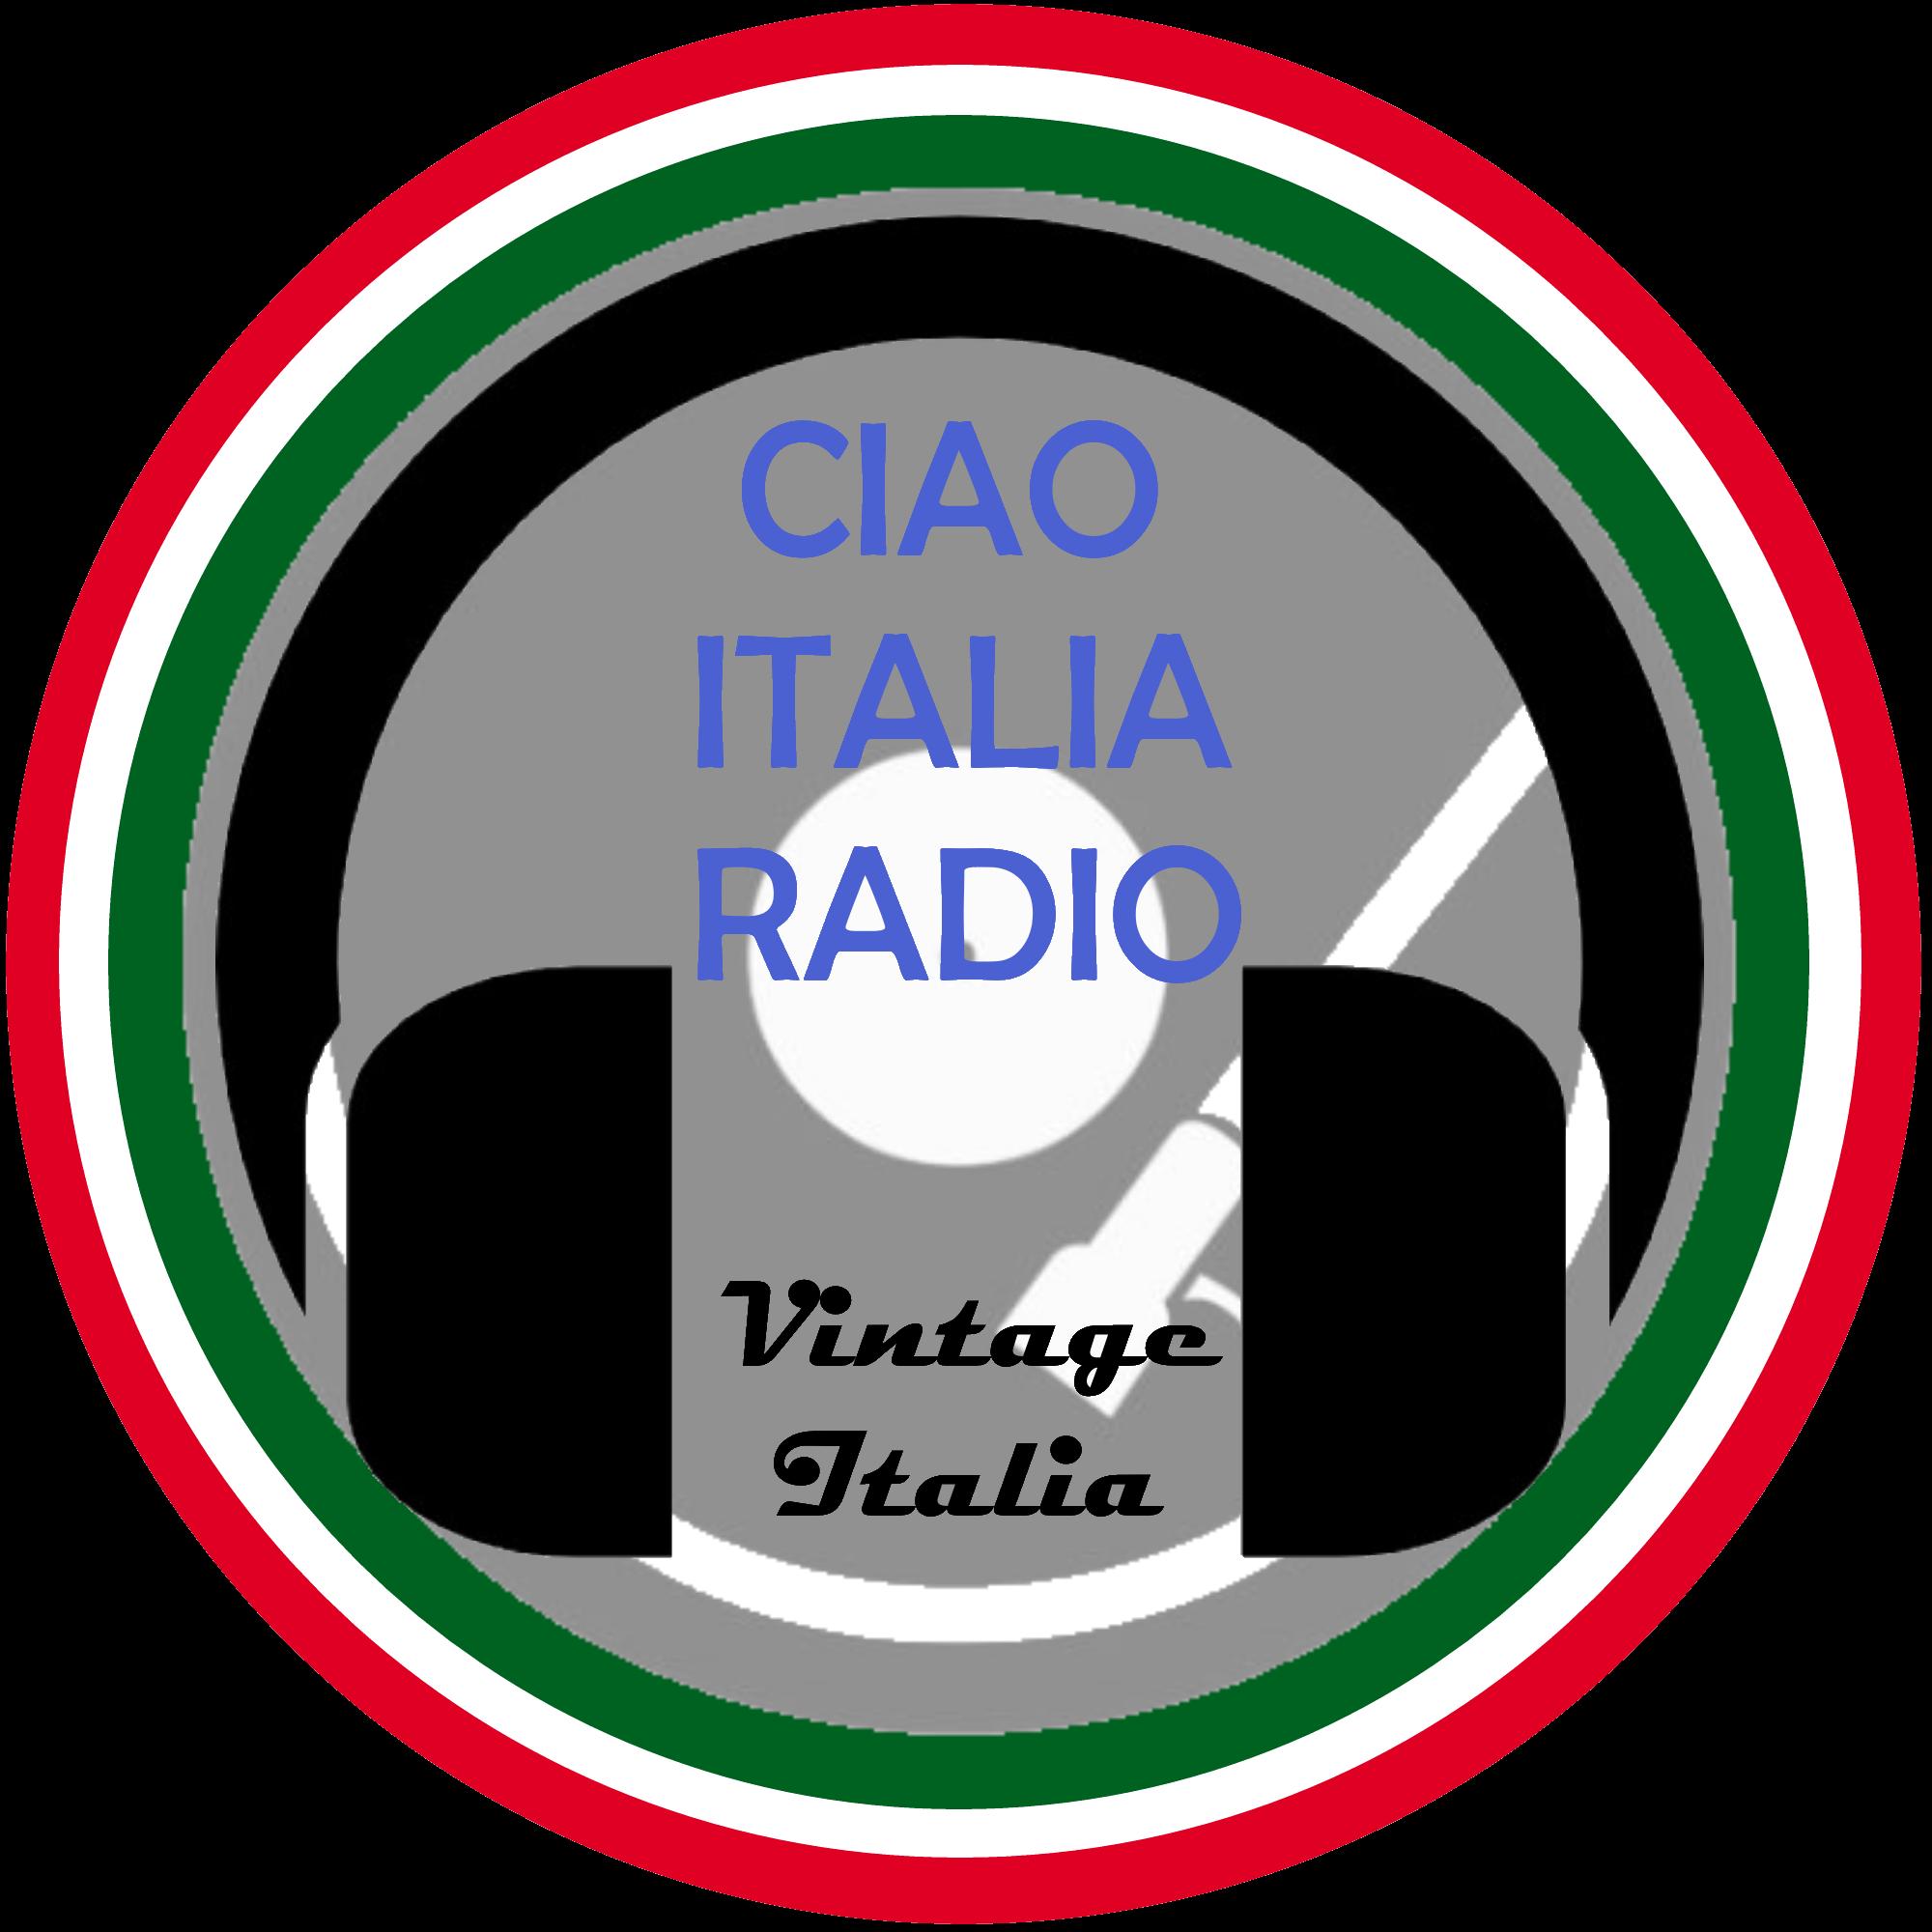 Ciao Italia Radio - Italian Classic Songs - 60 Anni di Musica Italiana - Italy